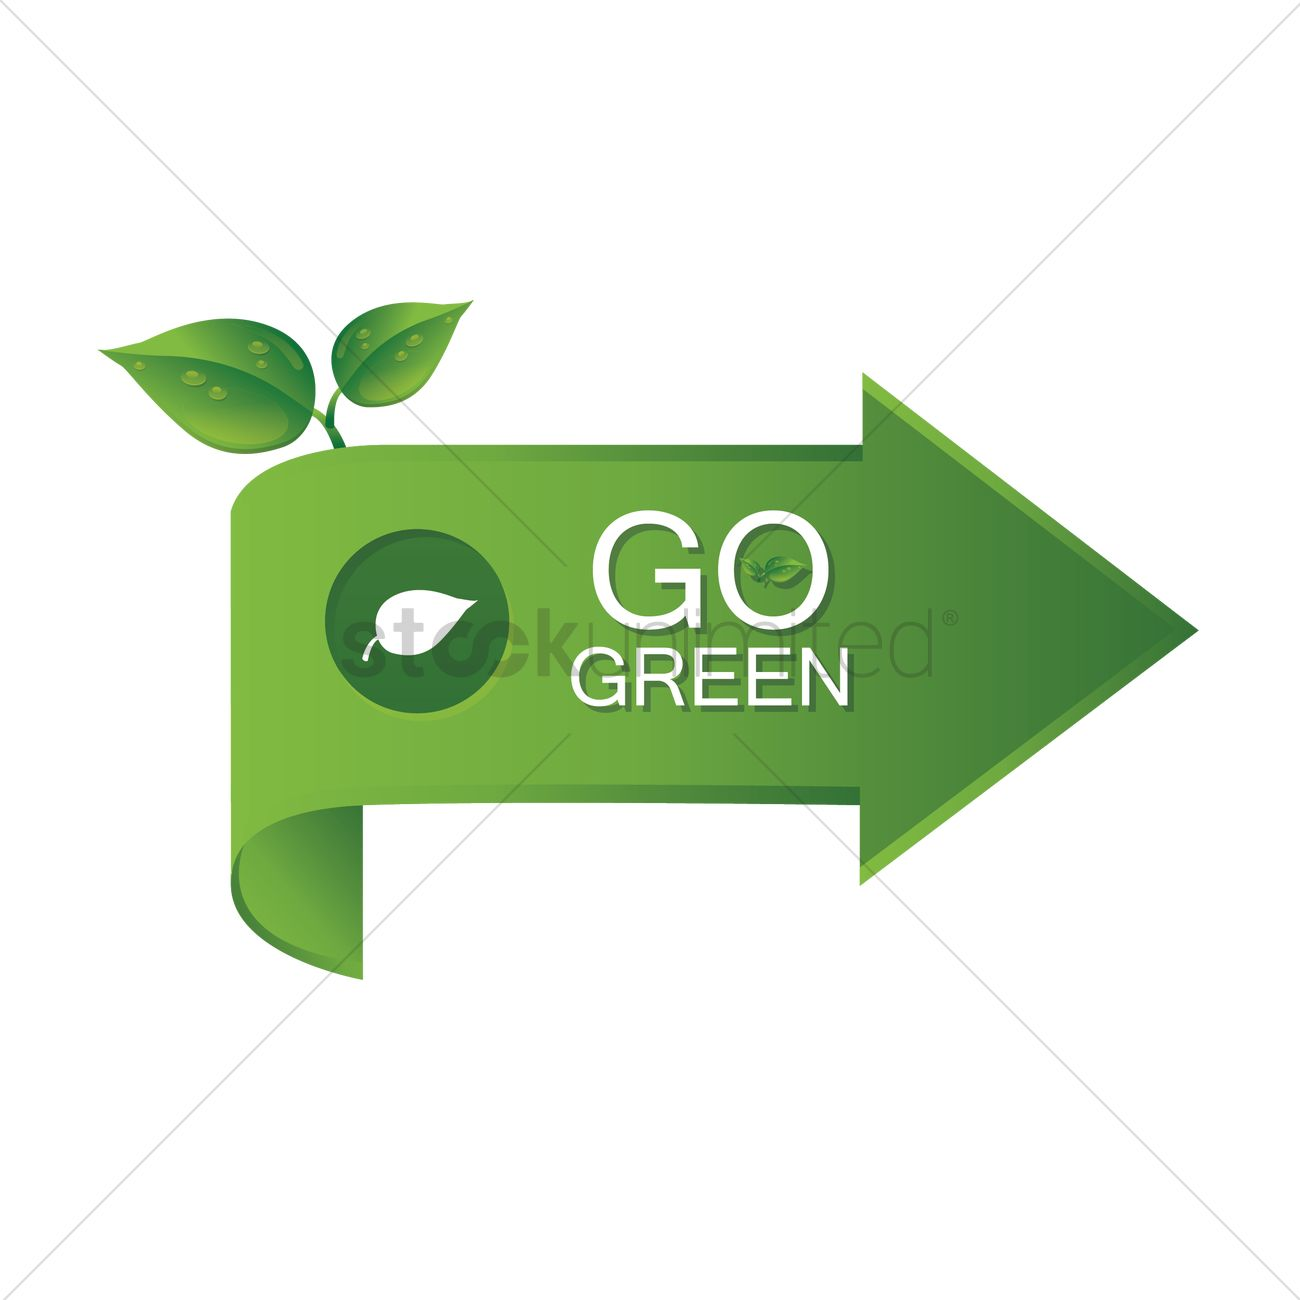 Go green arrow Vector Image - 1418710 | StockUnlimited